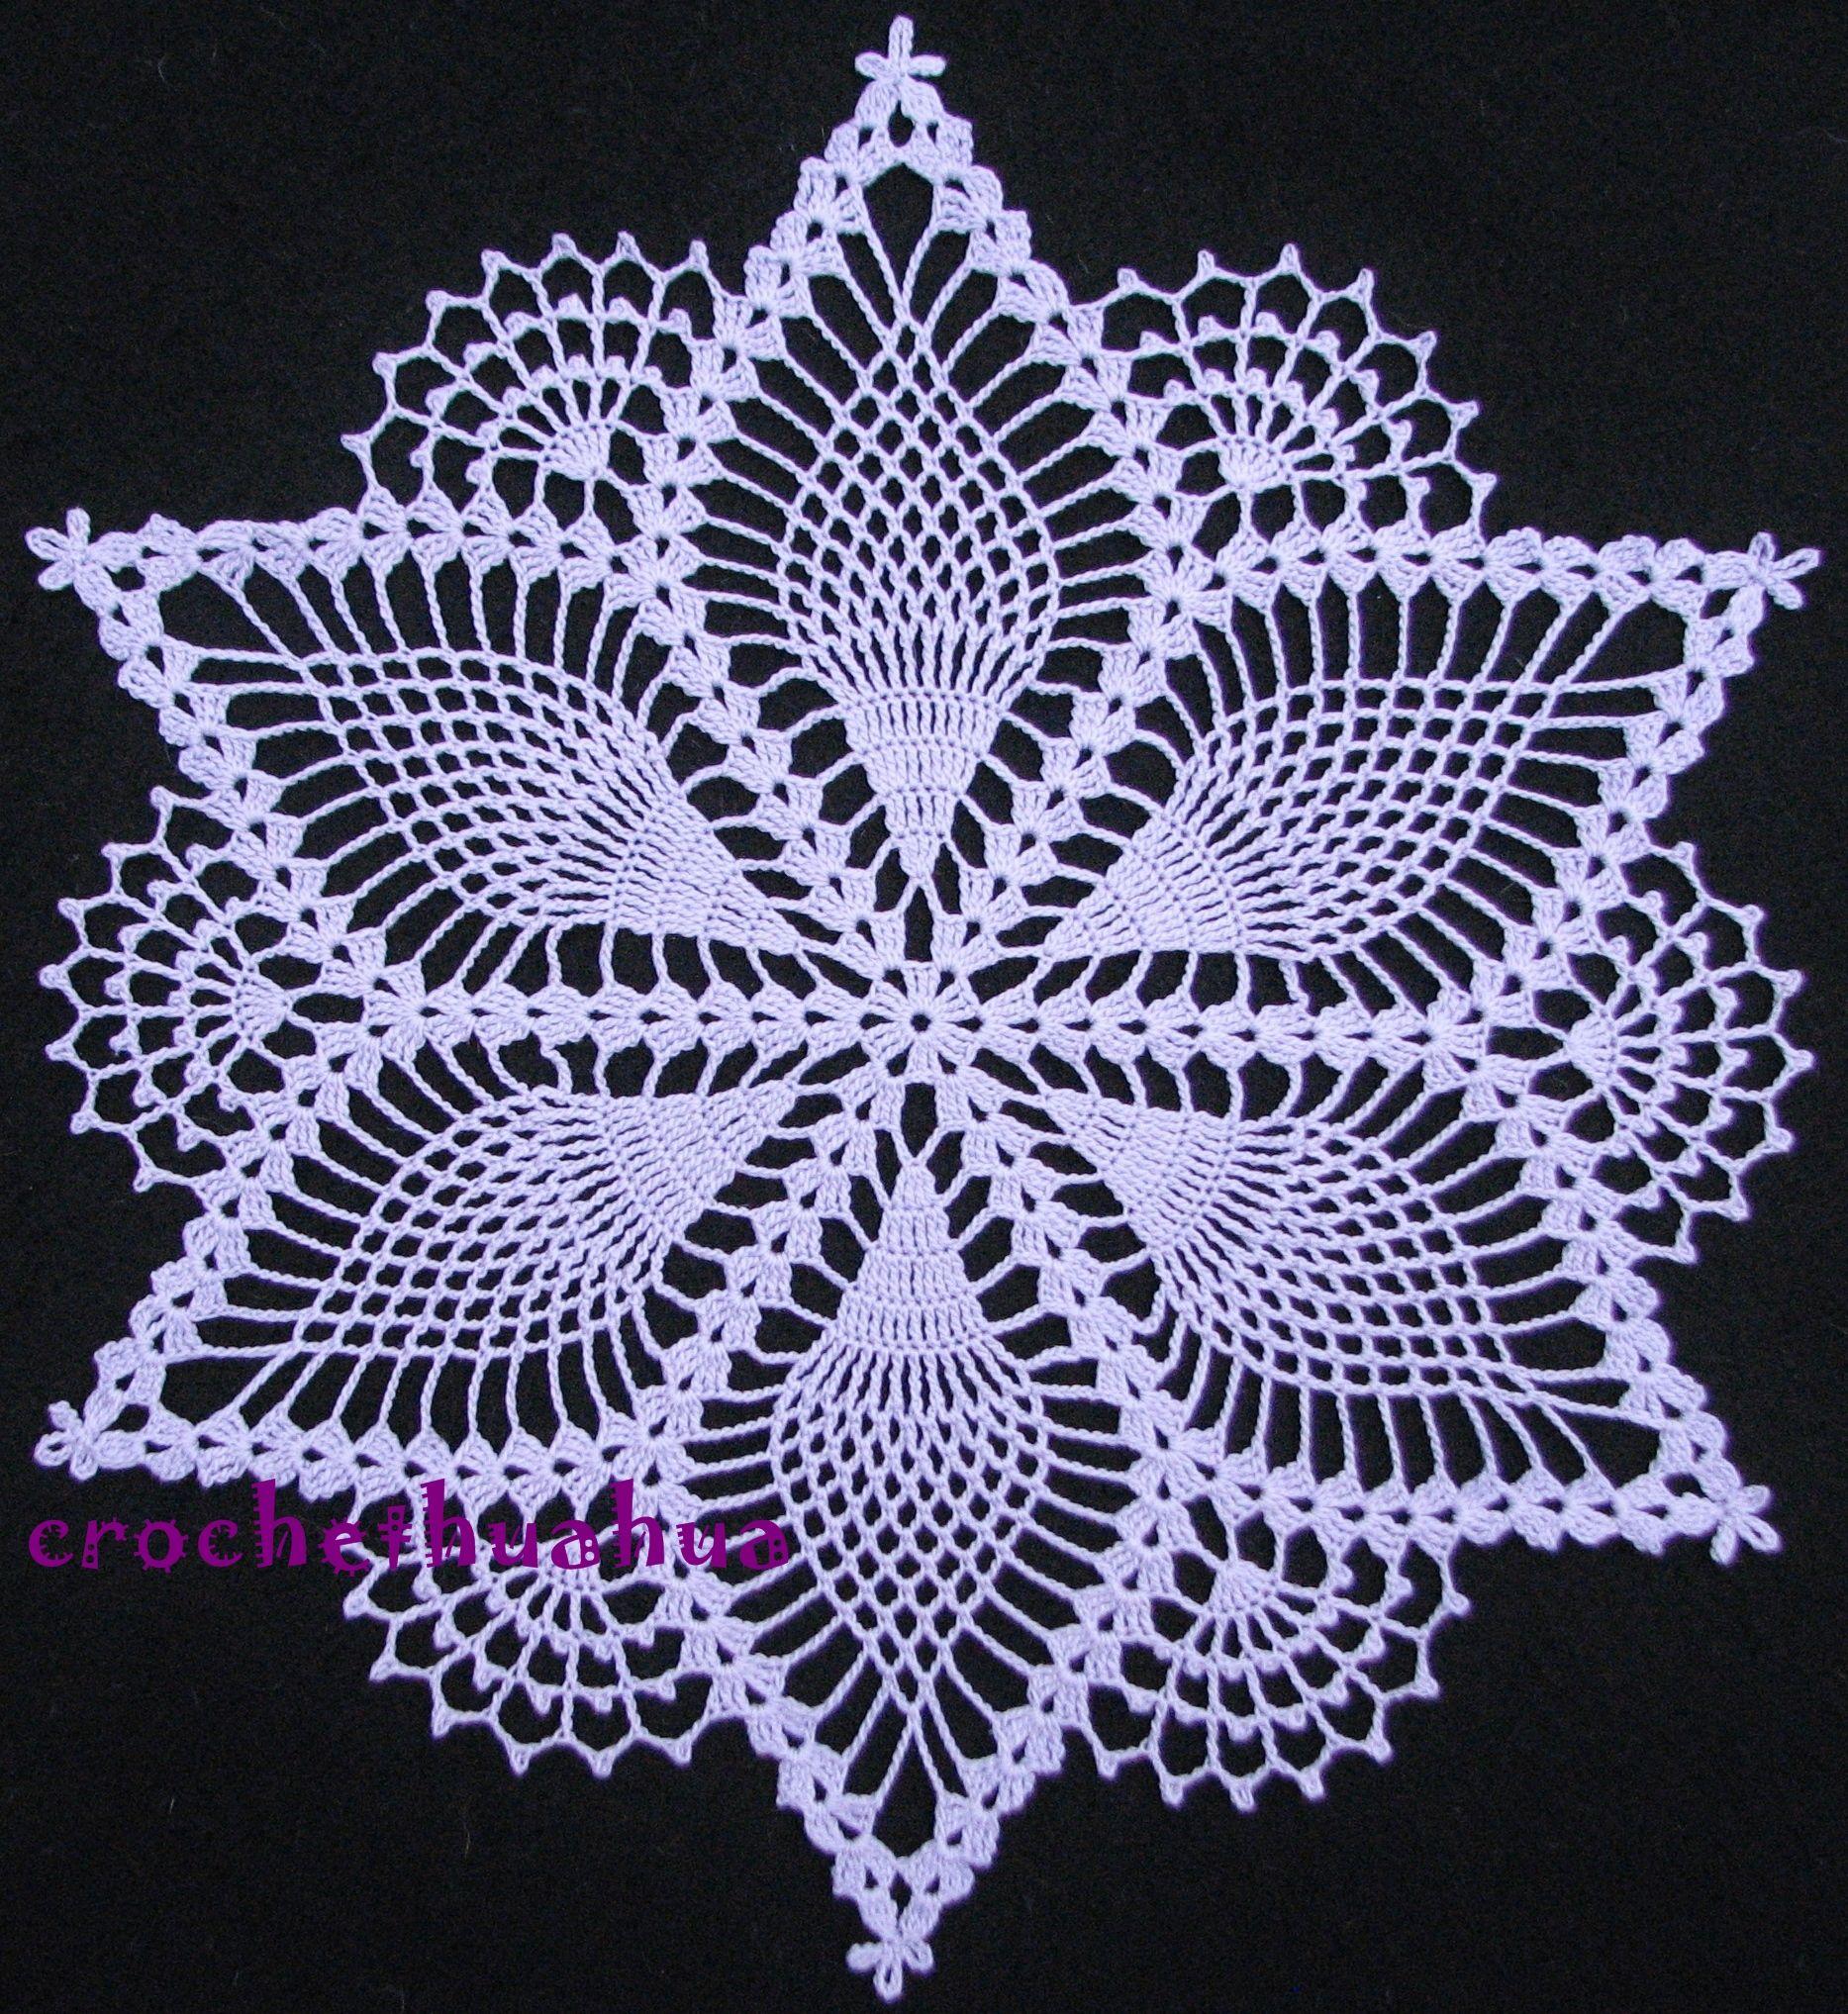 Pineapple Snowflake Doily | My Crochet Projects | Pinterest ...